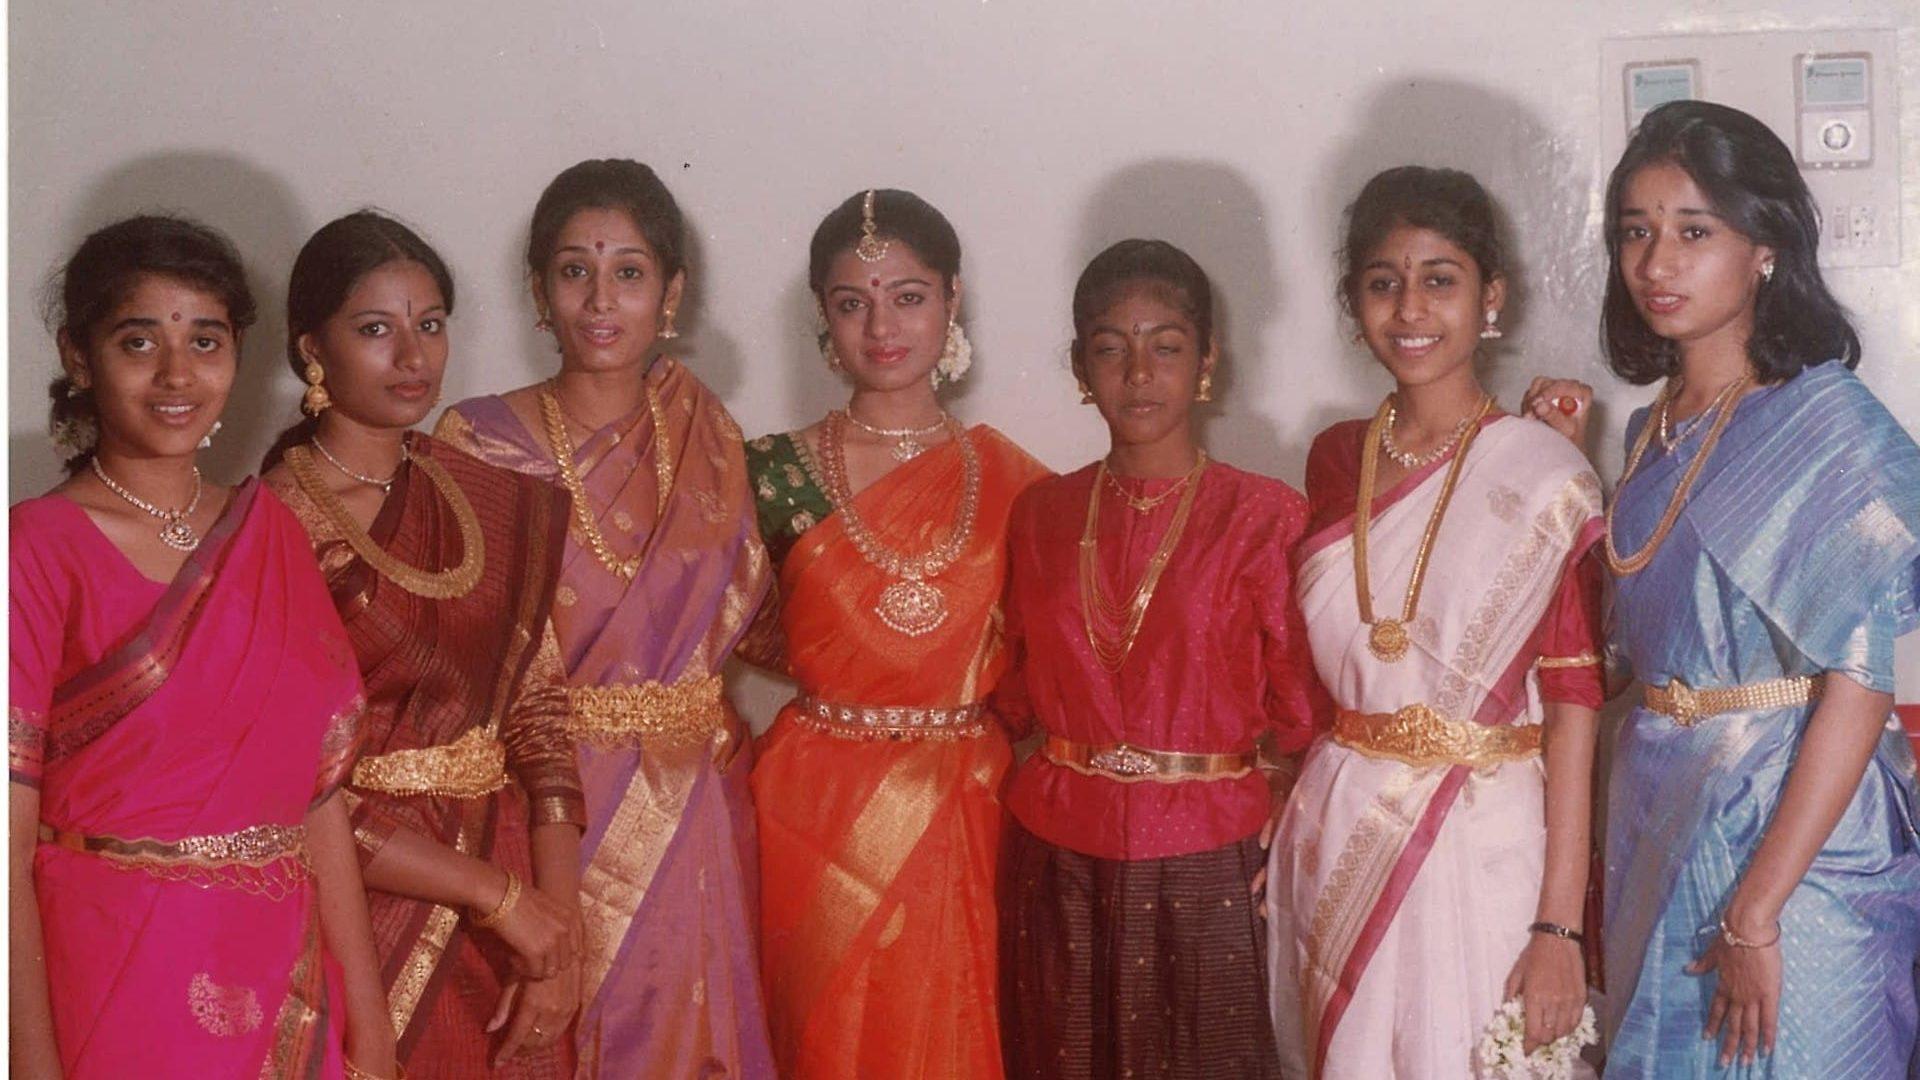 Ahalya wearing an oddiyanam (waistbelt) and matching chain.